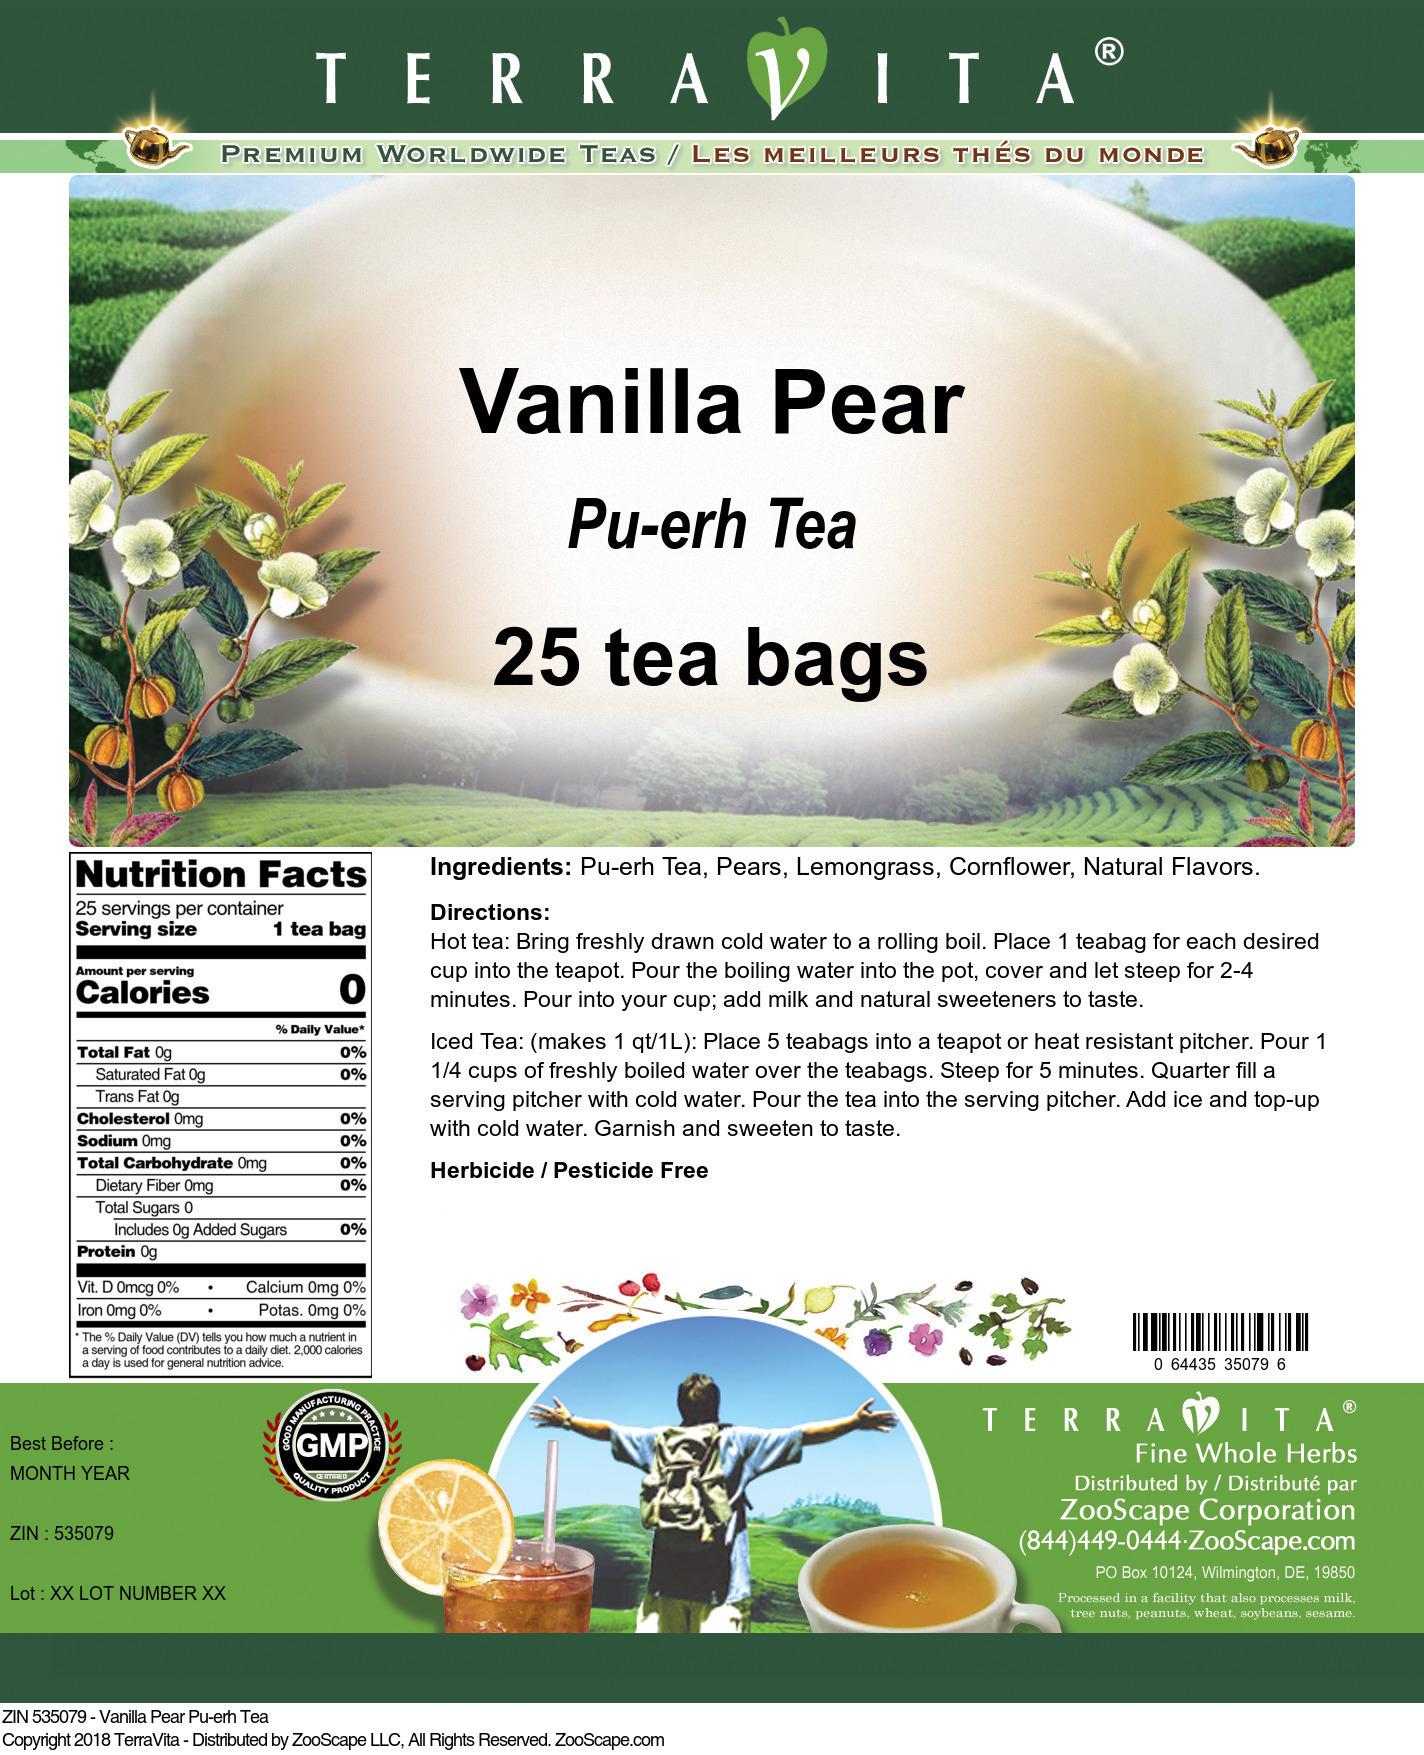 Vanilla Pear Pu-erh Tea